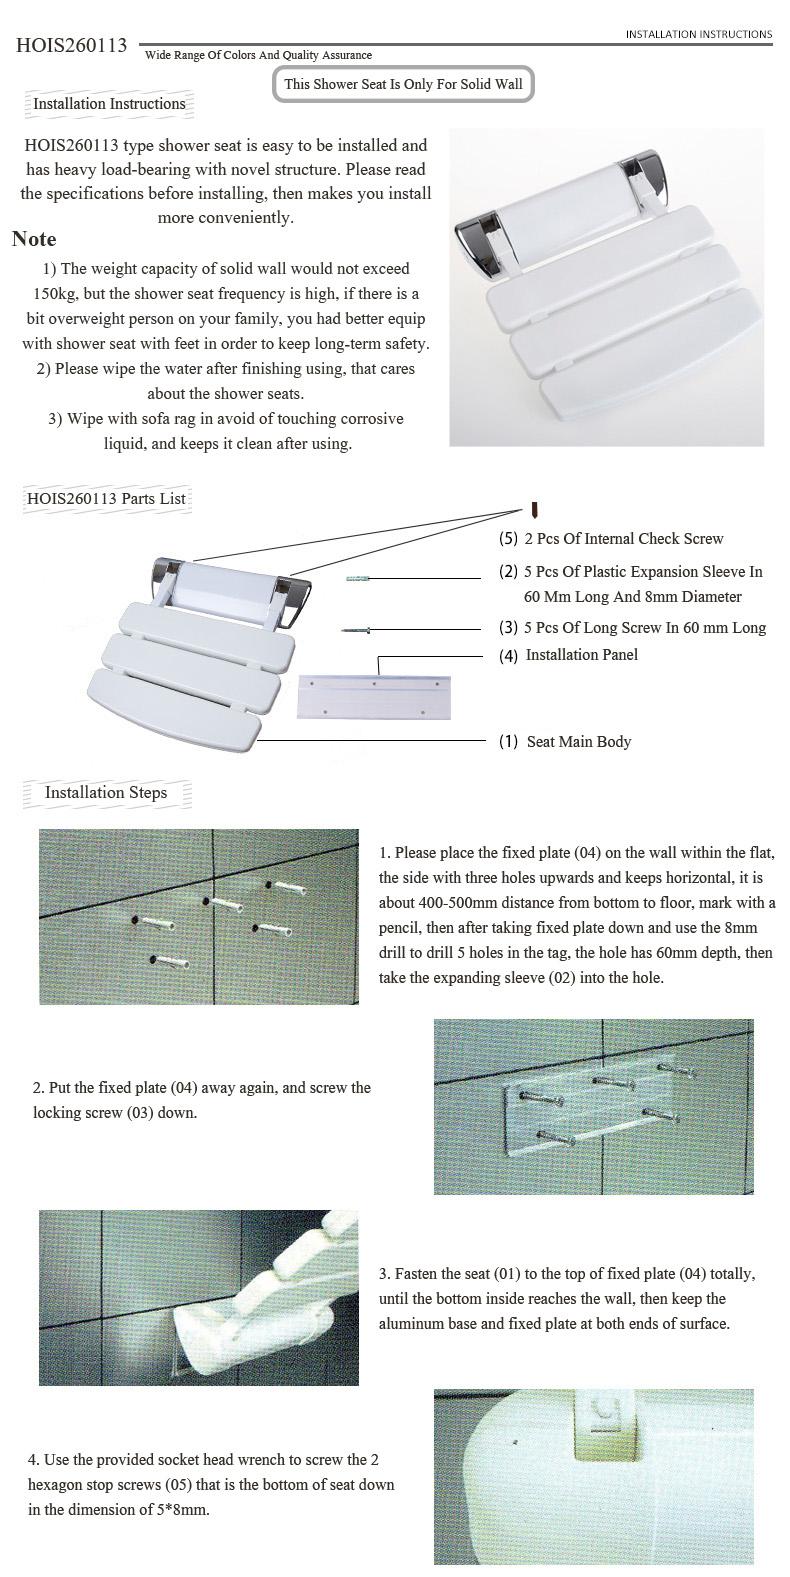 HOIS260113 Installation Method